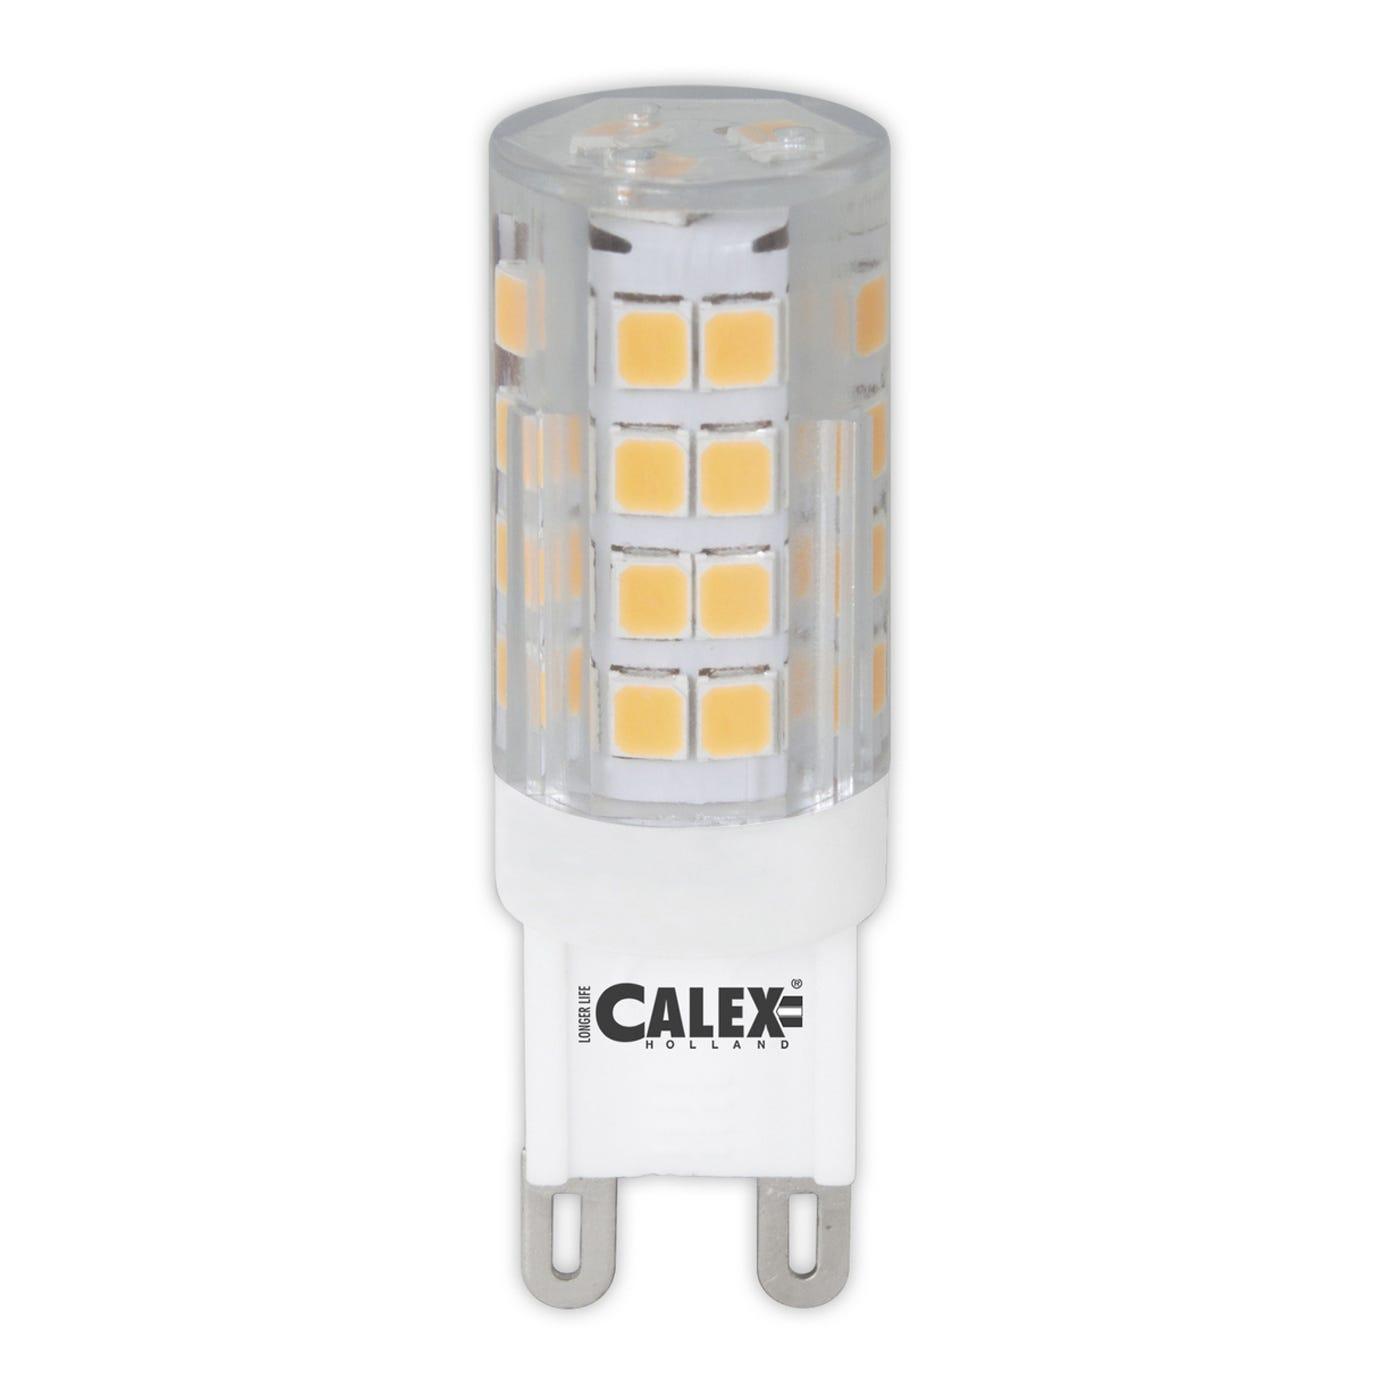 LED G9 Bulb 3.5W Clear Lens